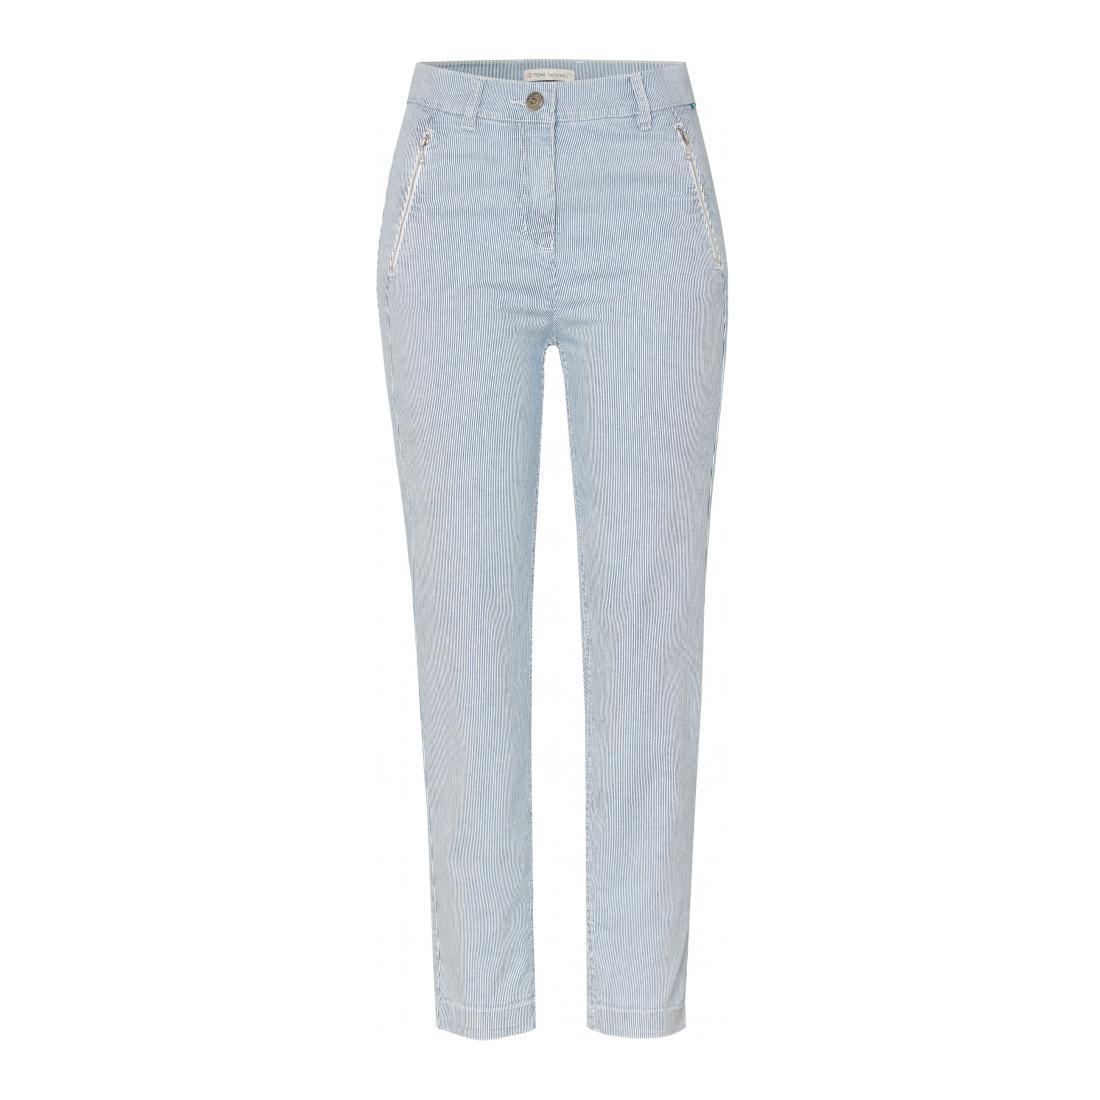 TONI DRESS Jeans Damen CS-be loved 7/8